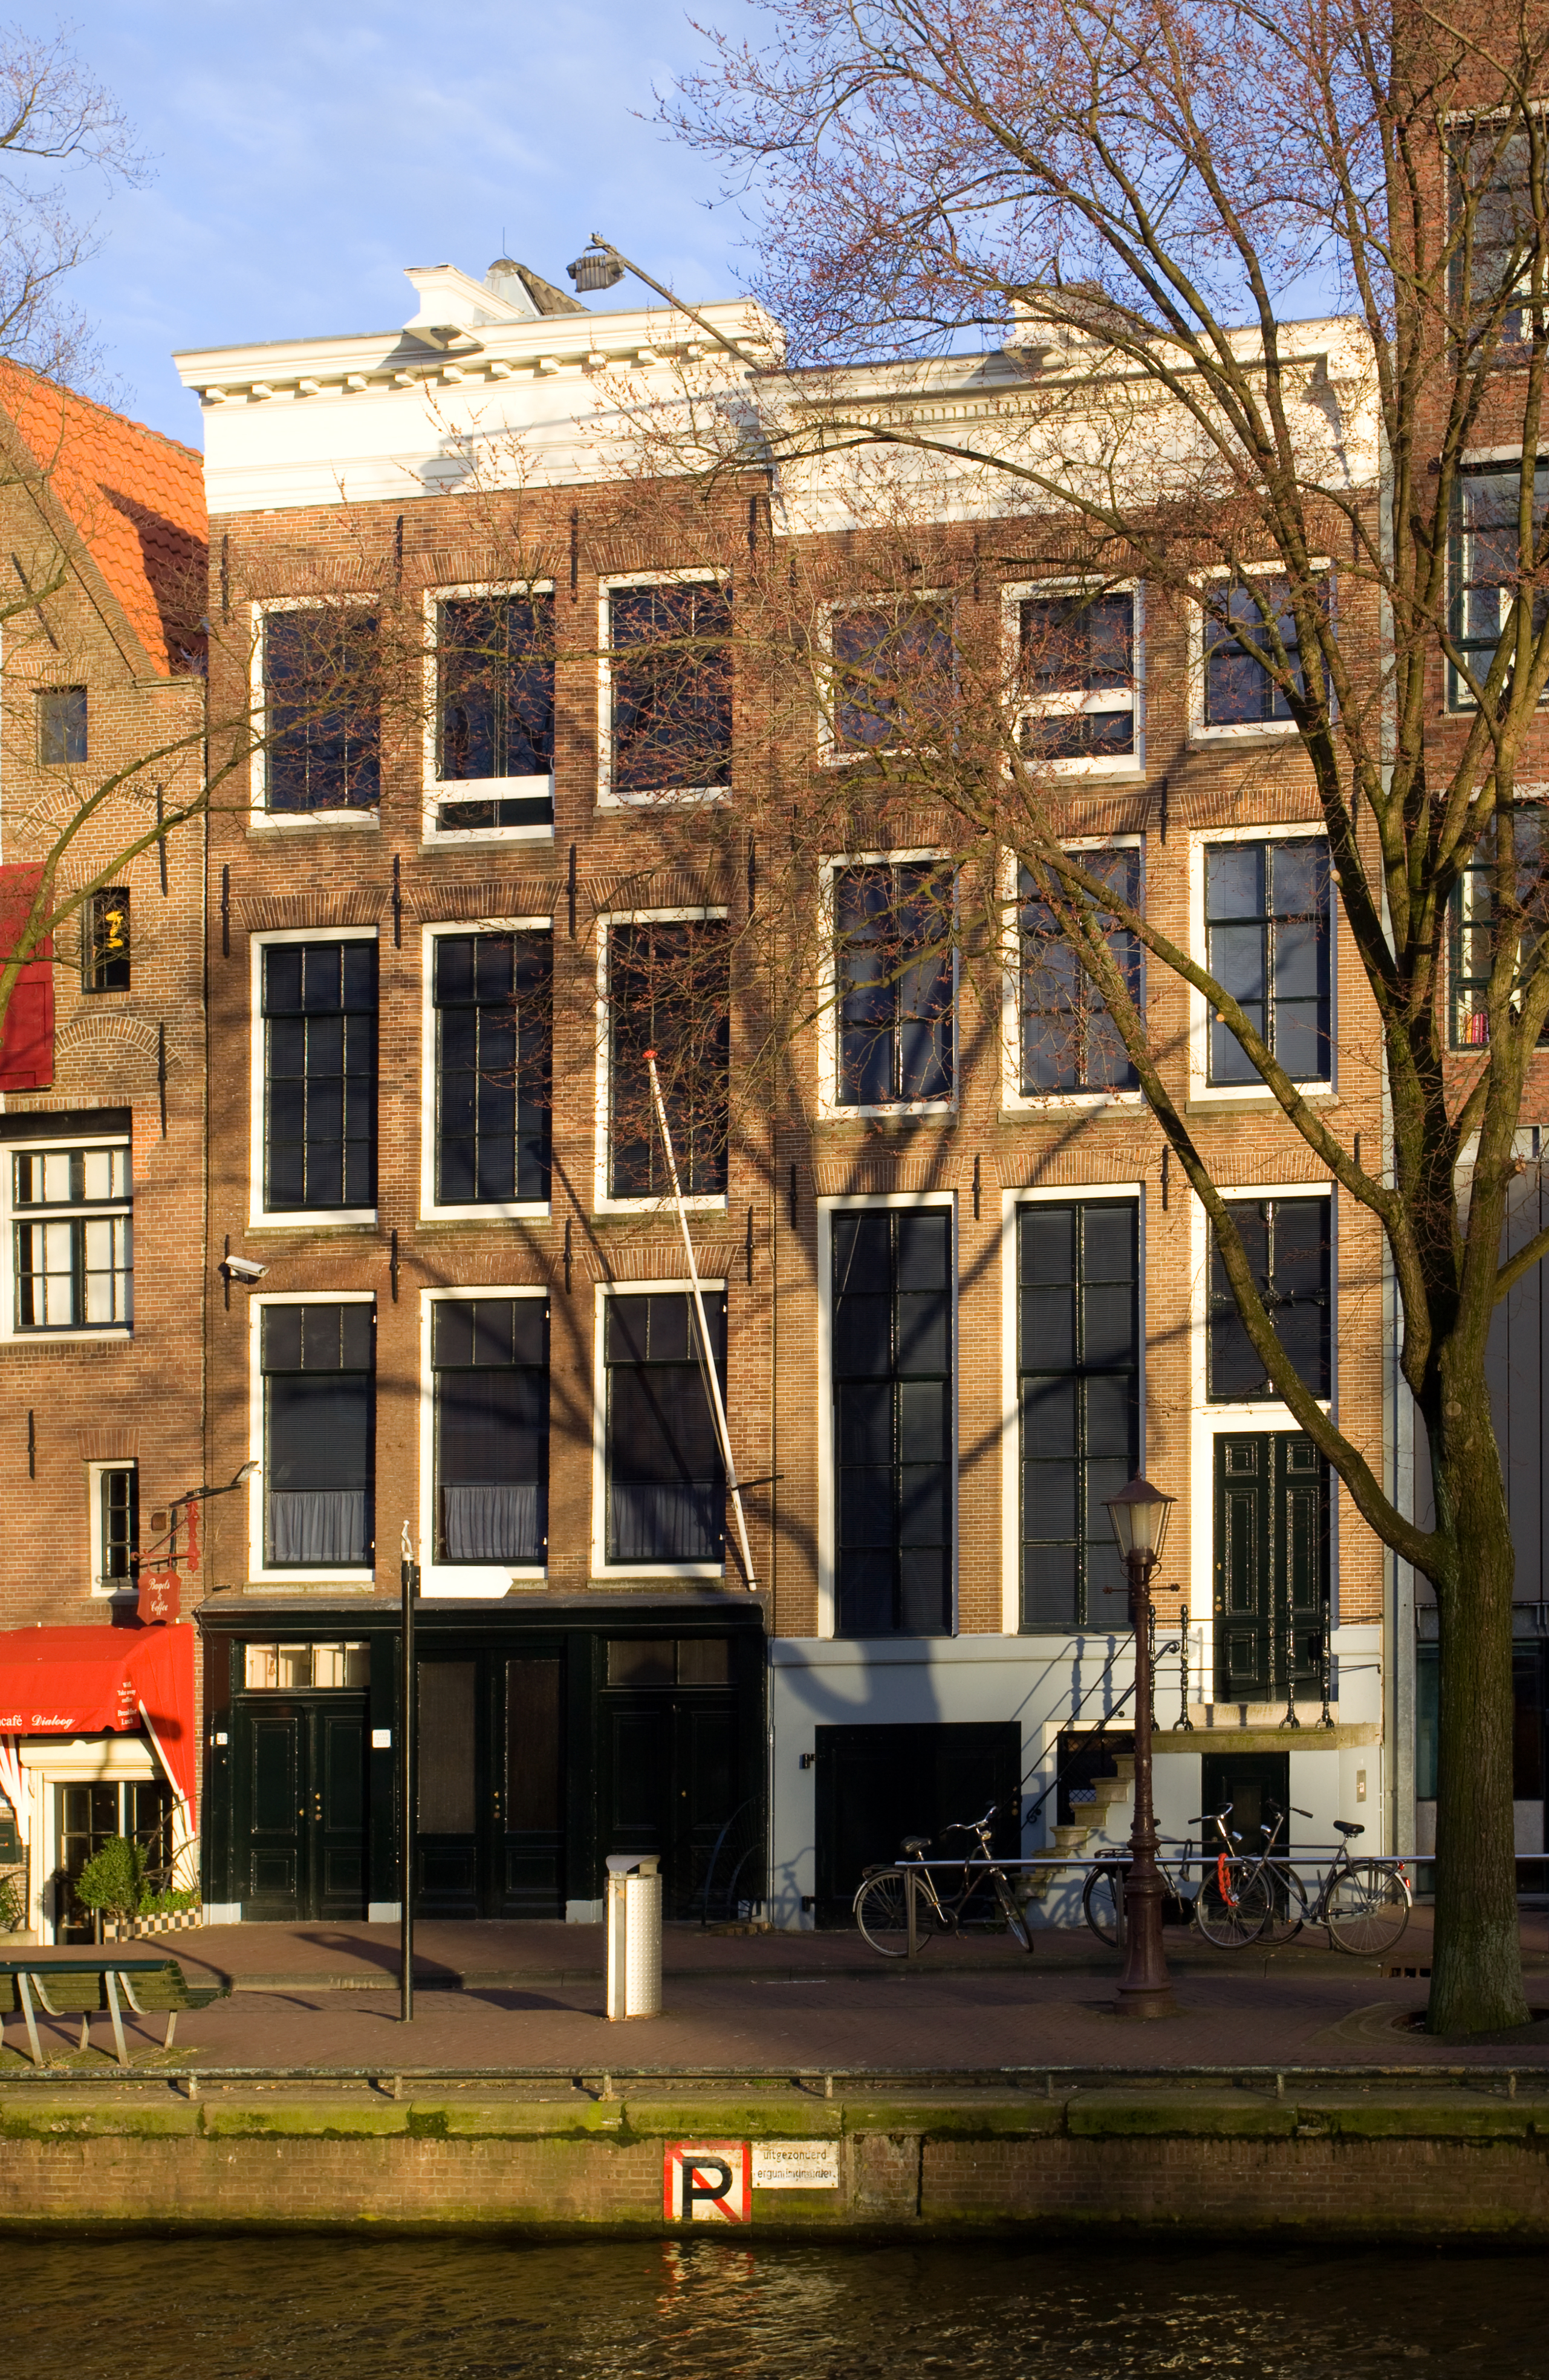 Anne Frank House (Amsterdam)